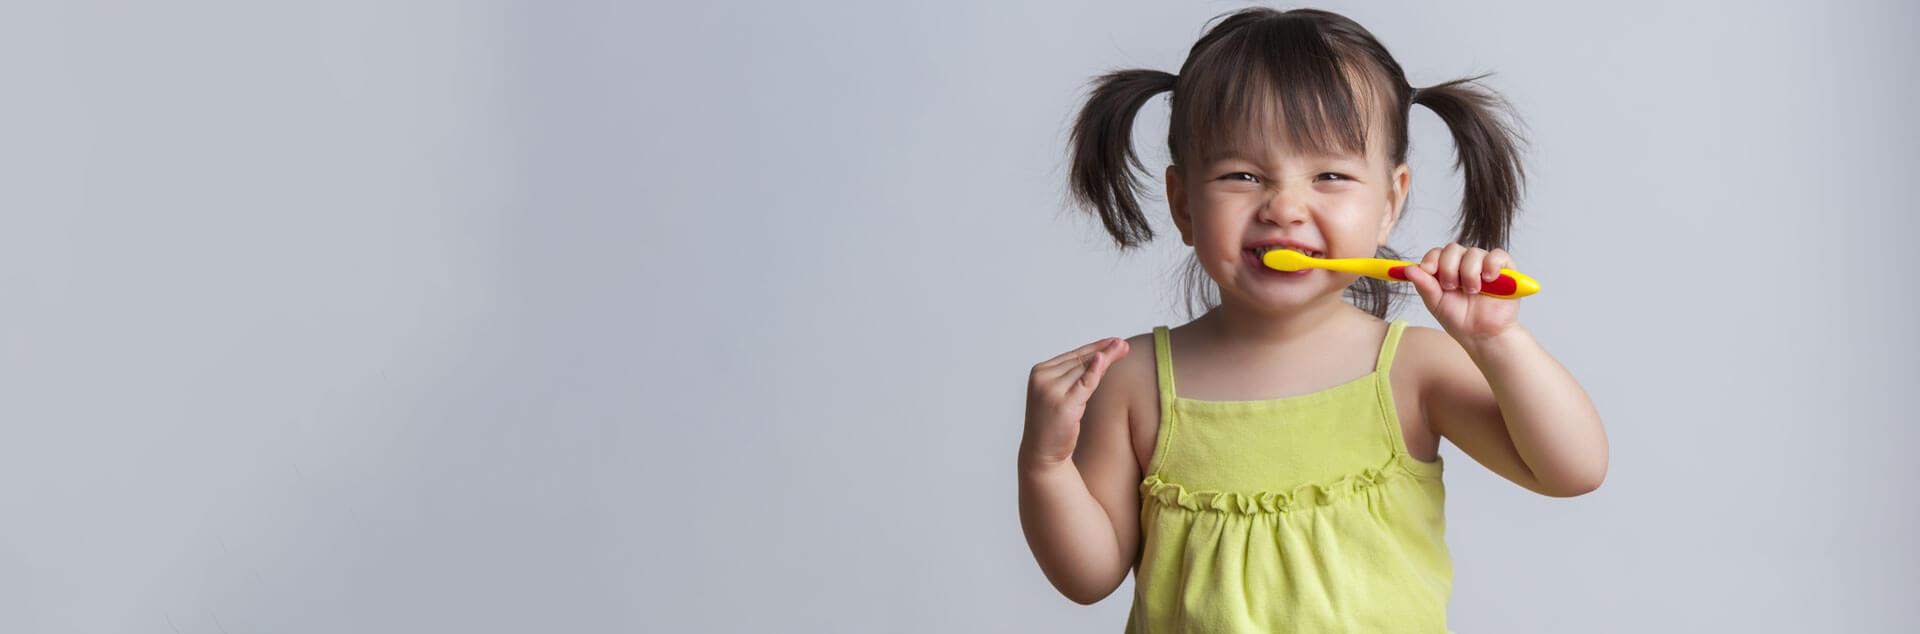 Little girl brushing her teeth in grey background